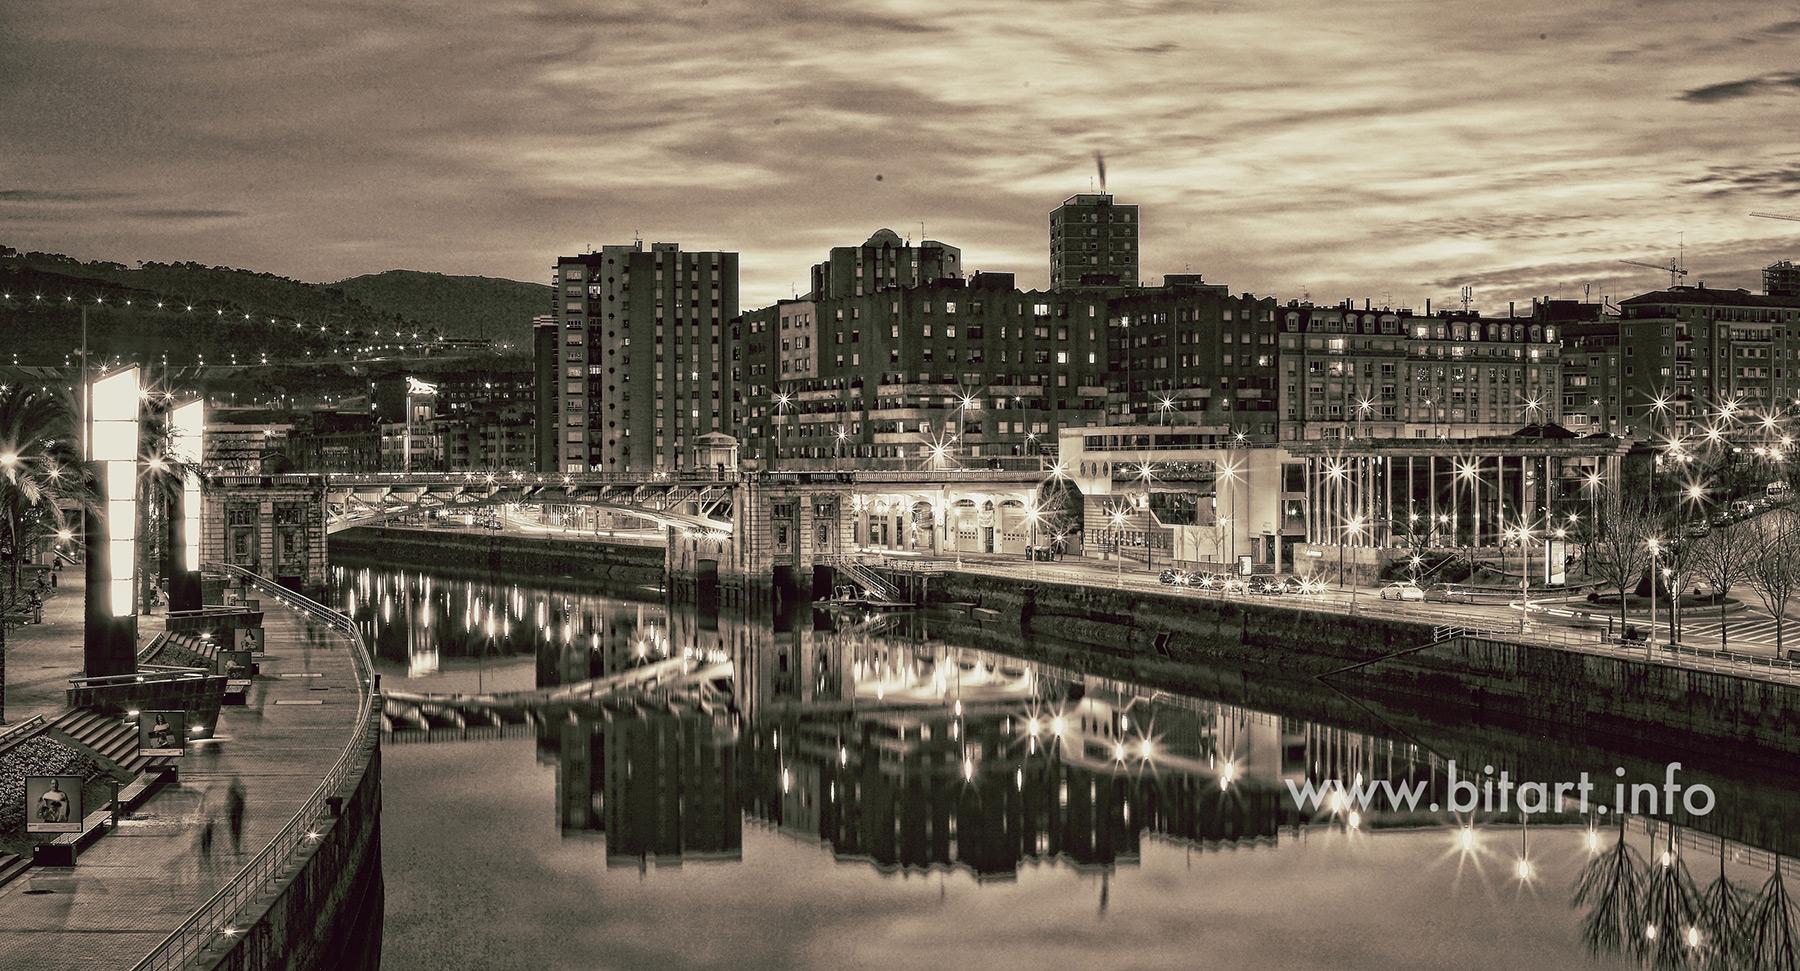 Bilbao vintage - Bitart New Media